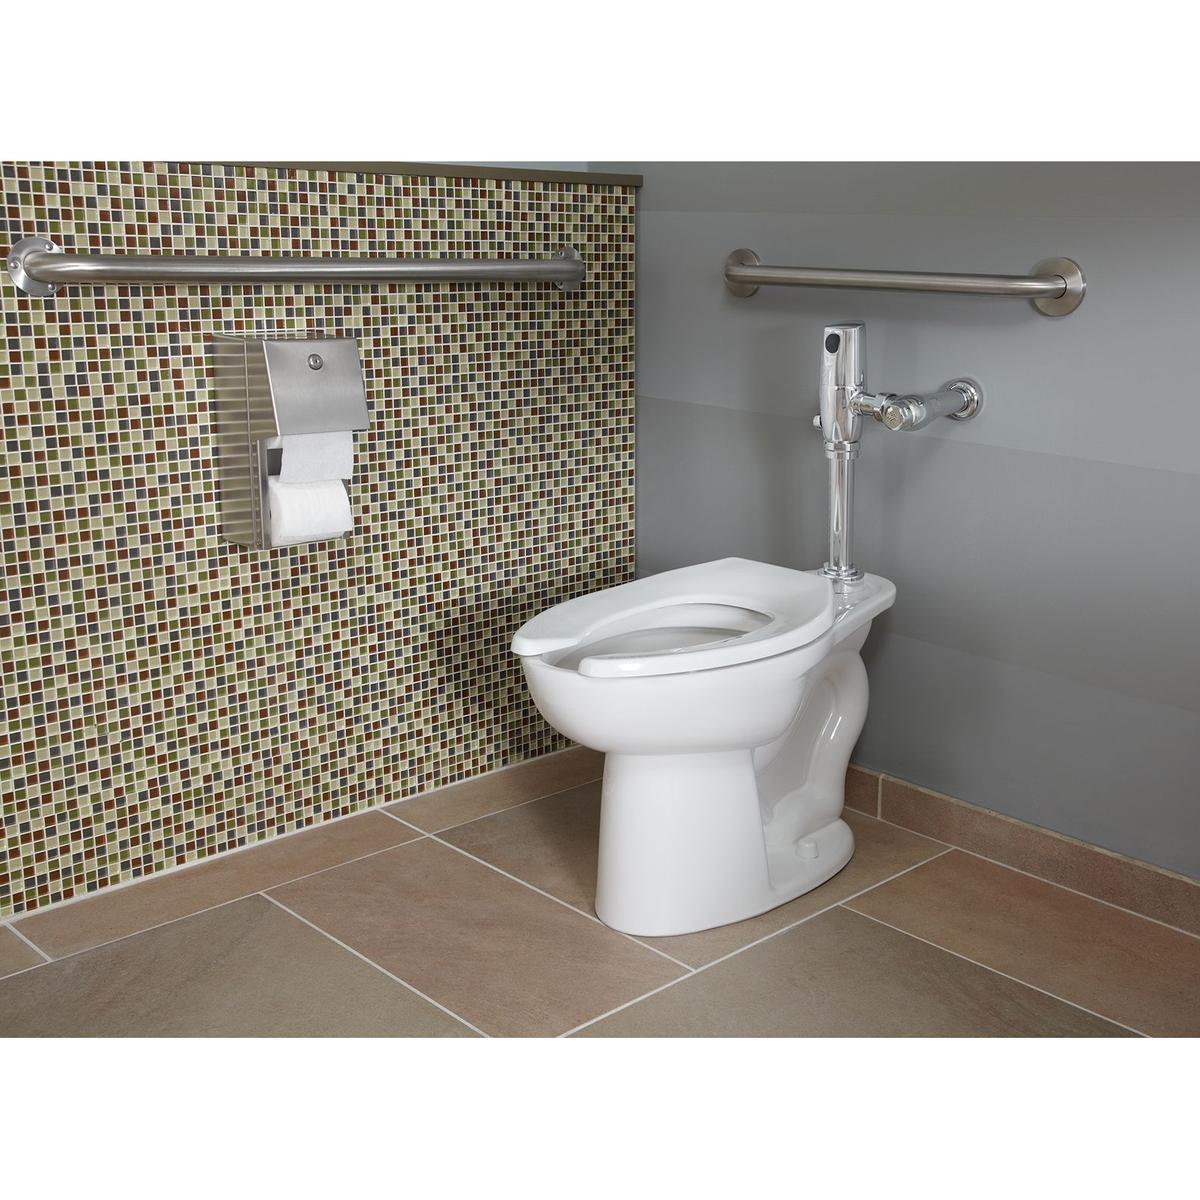 American Standard Tankless Toilet Bowl: 1.1 gal/1.3 gal/1.6 gal ...